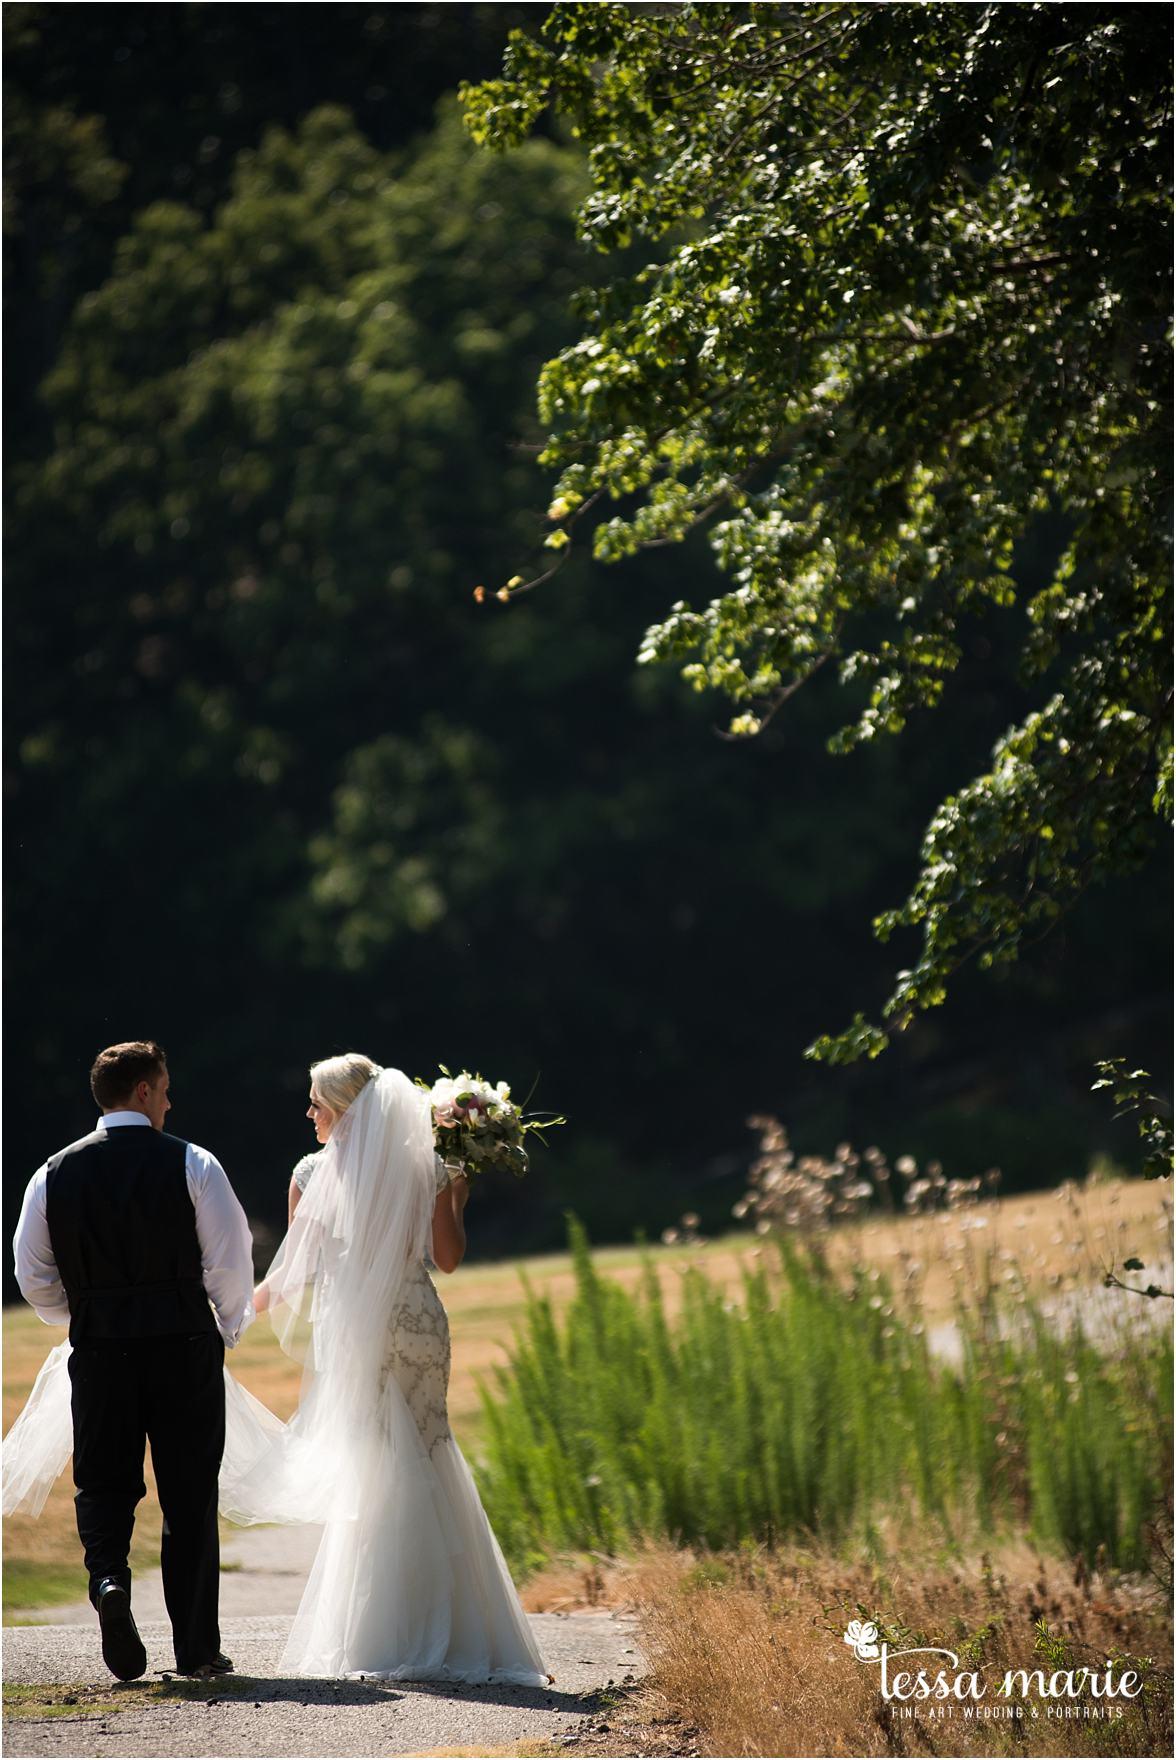 lake_lanier_wedding_summer_pictures_legacy_moments_family_candid_atlantas_best_wedding_photographer_tessa_marie_weddings_lake_lanier_bride_out_door_wedding_0163